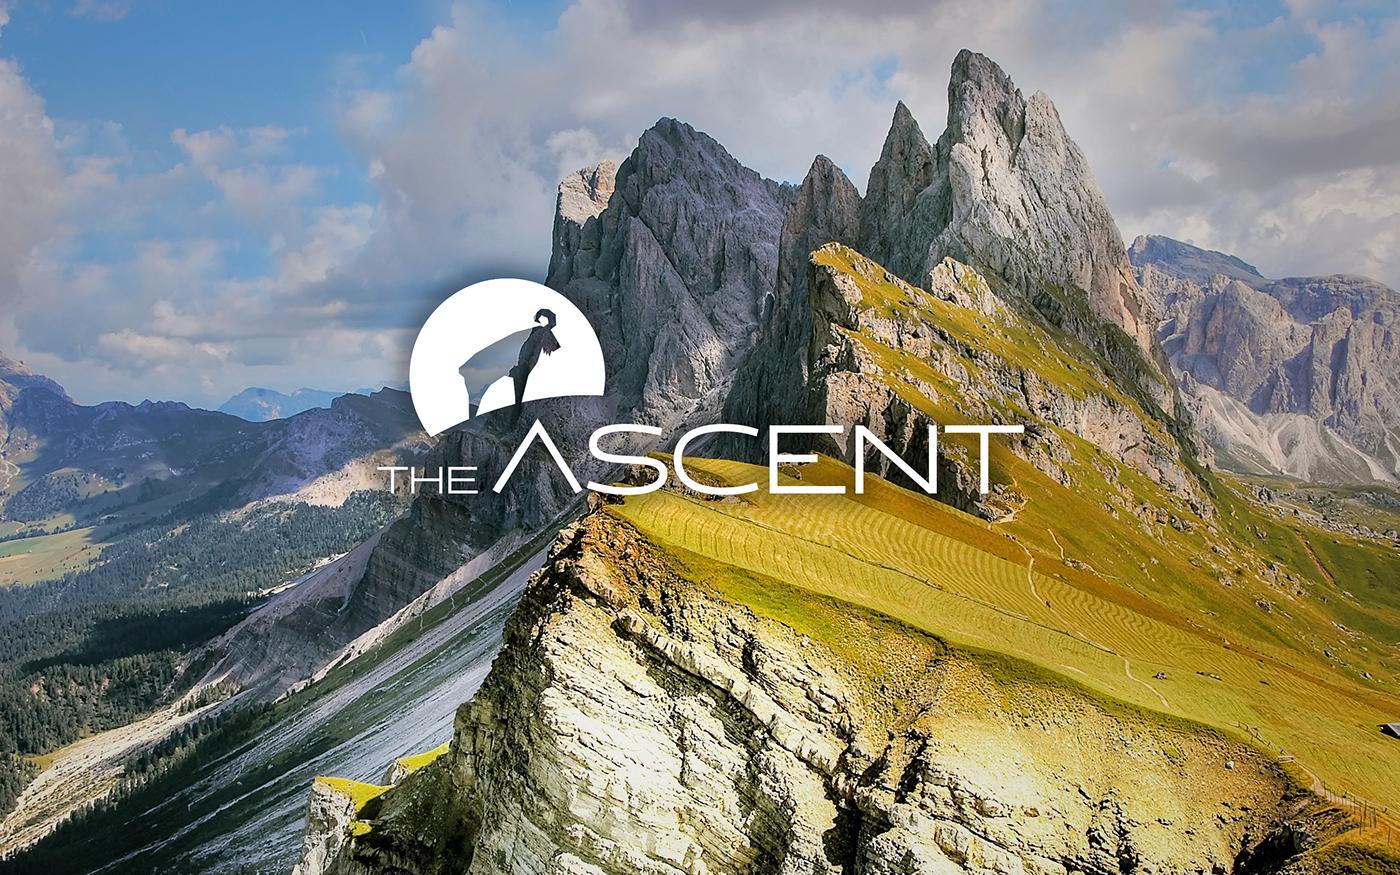 The Ascent rock climbing outdoors goat